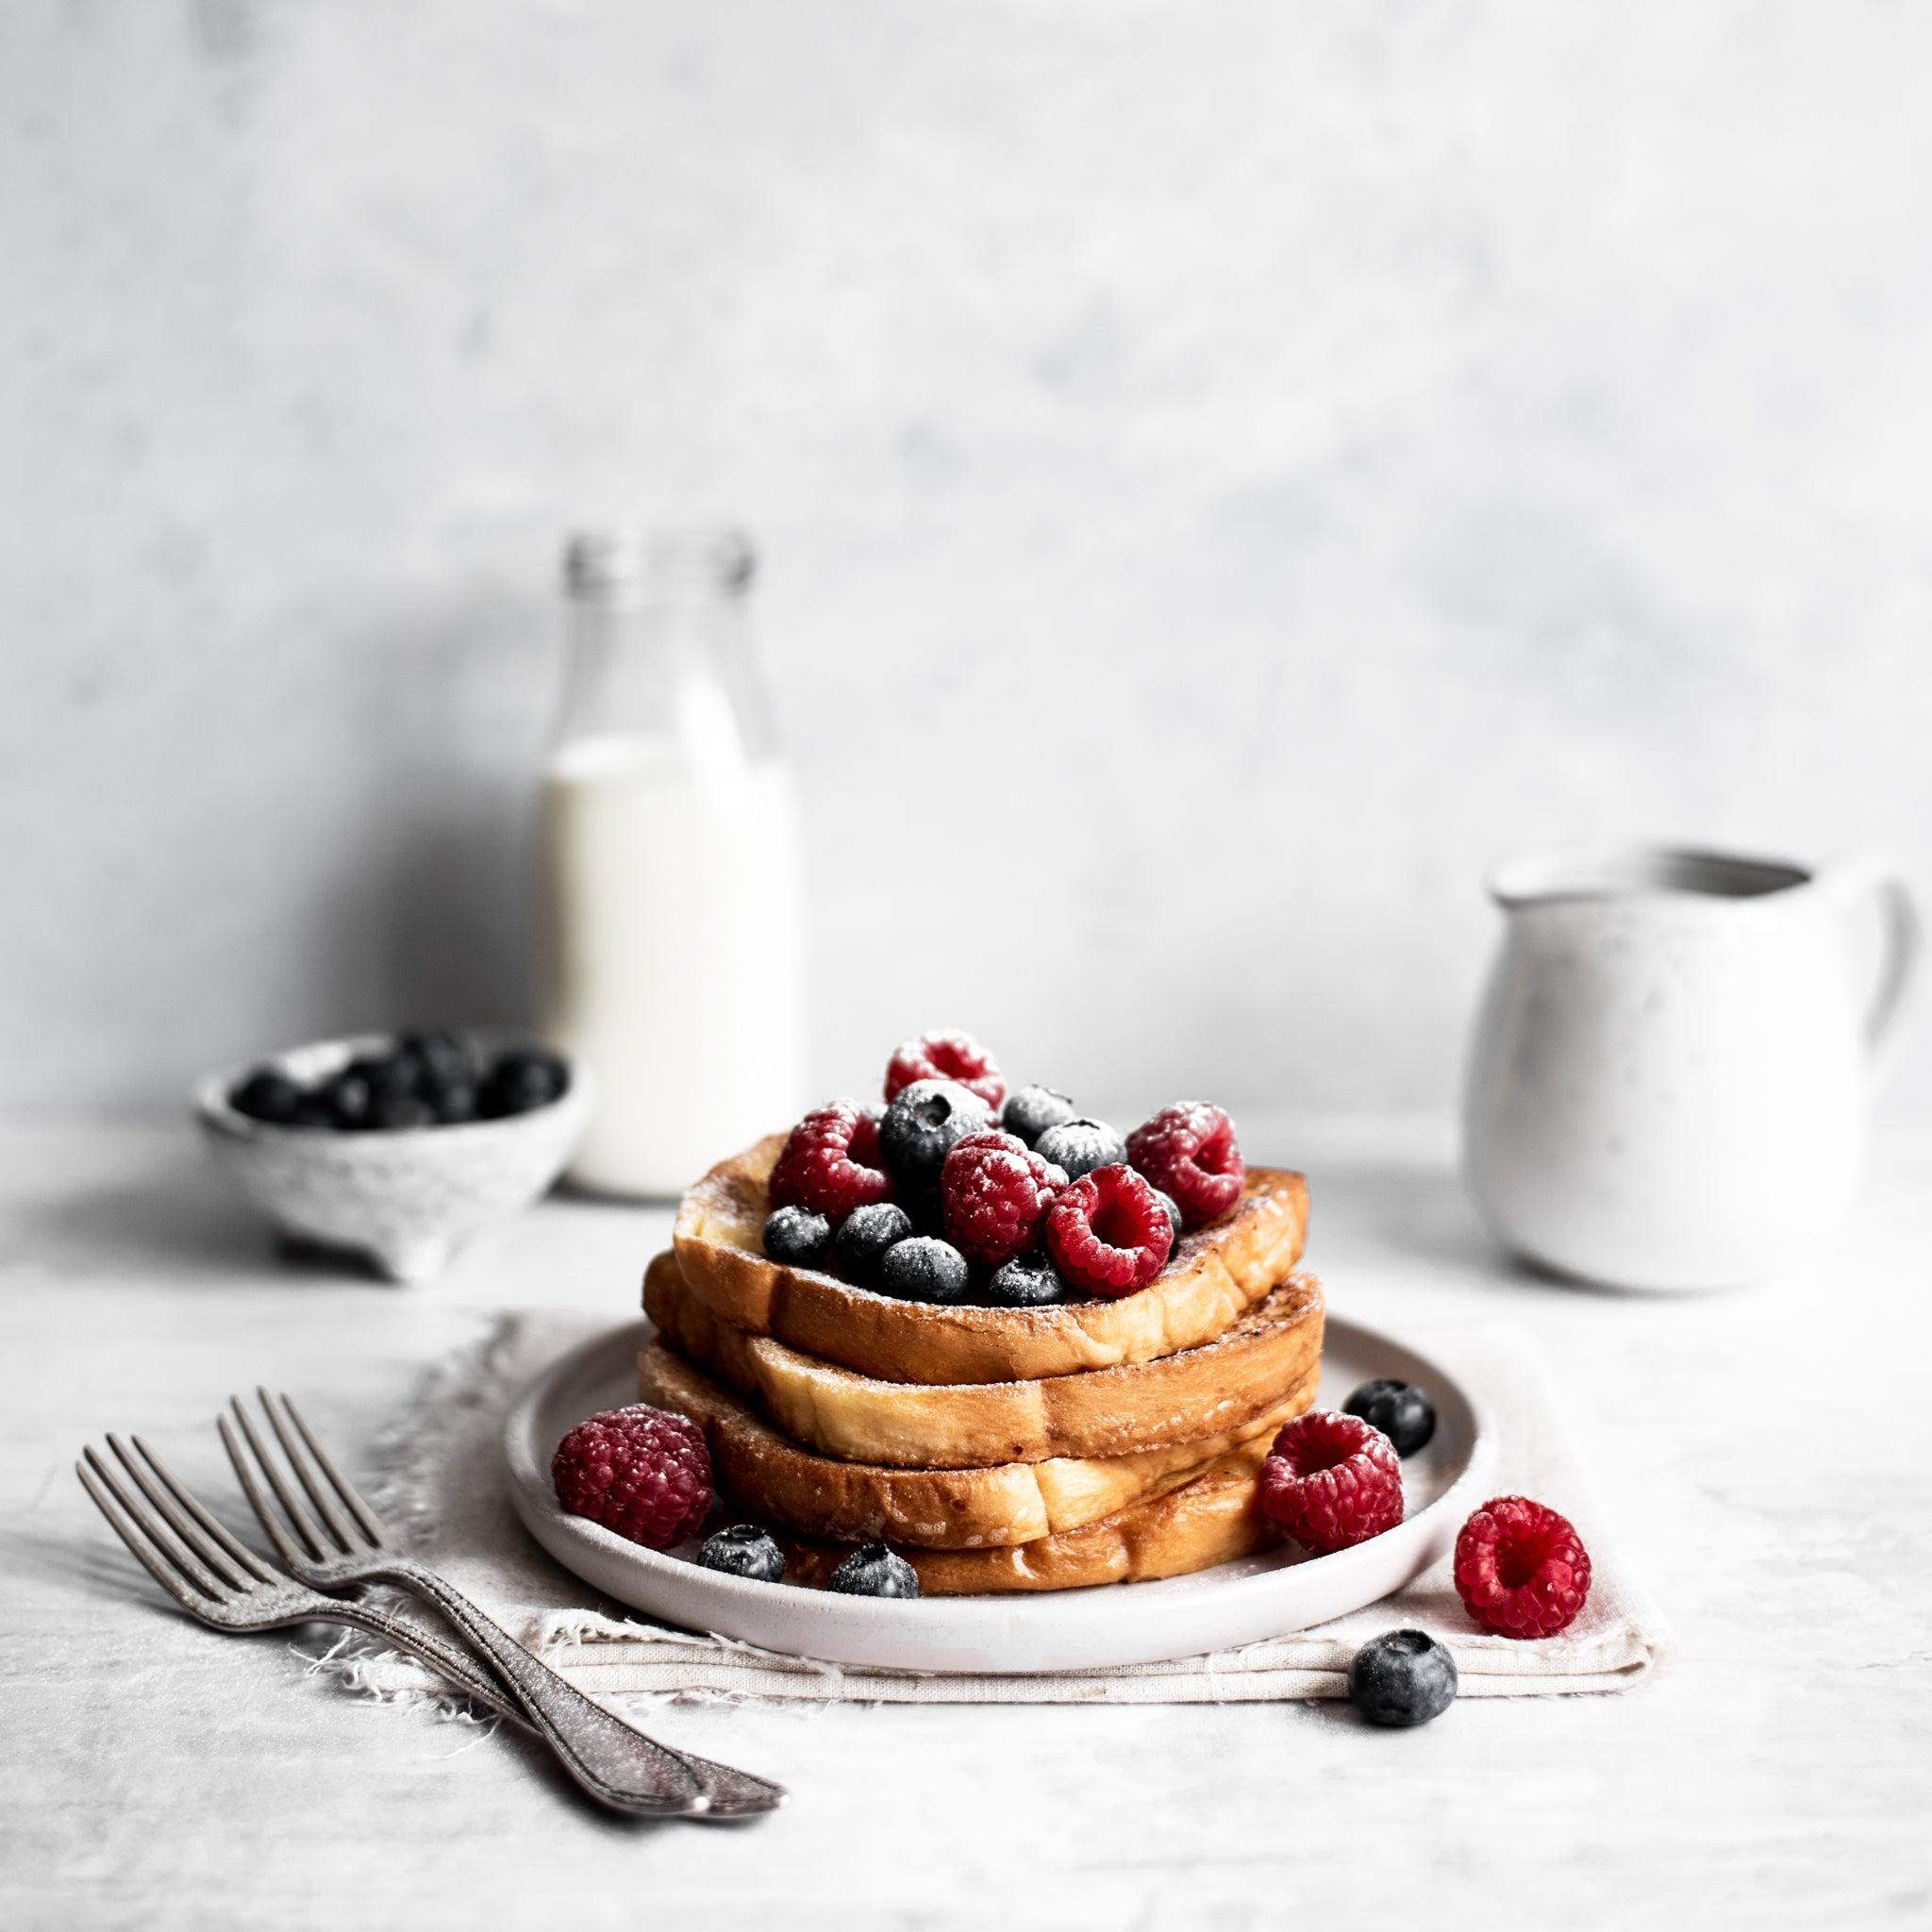 Vanilla-French-Toast-SQUARE-2.jpg